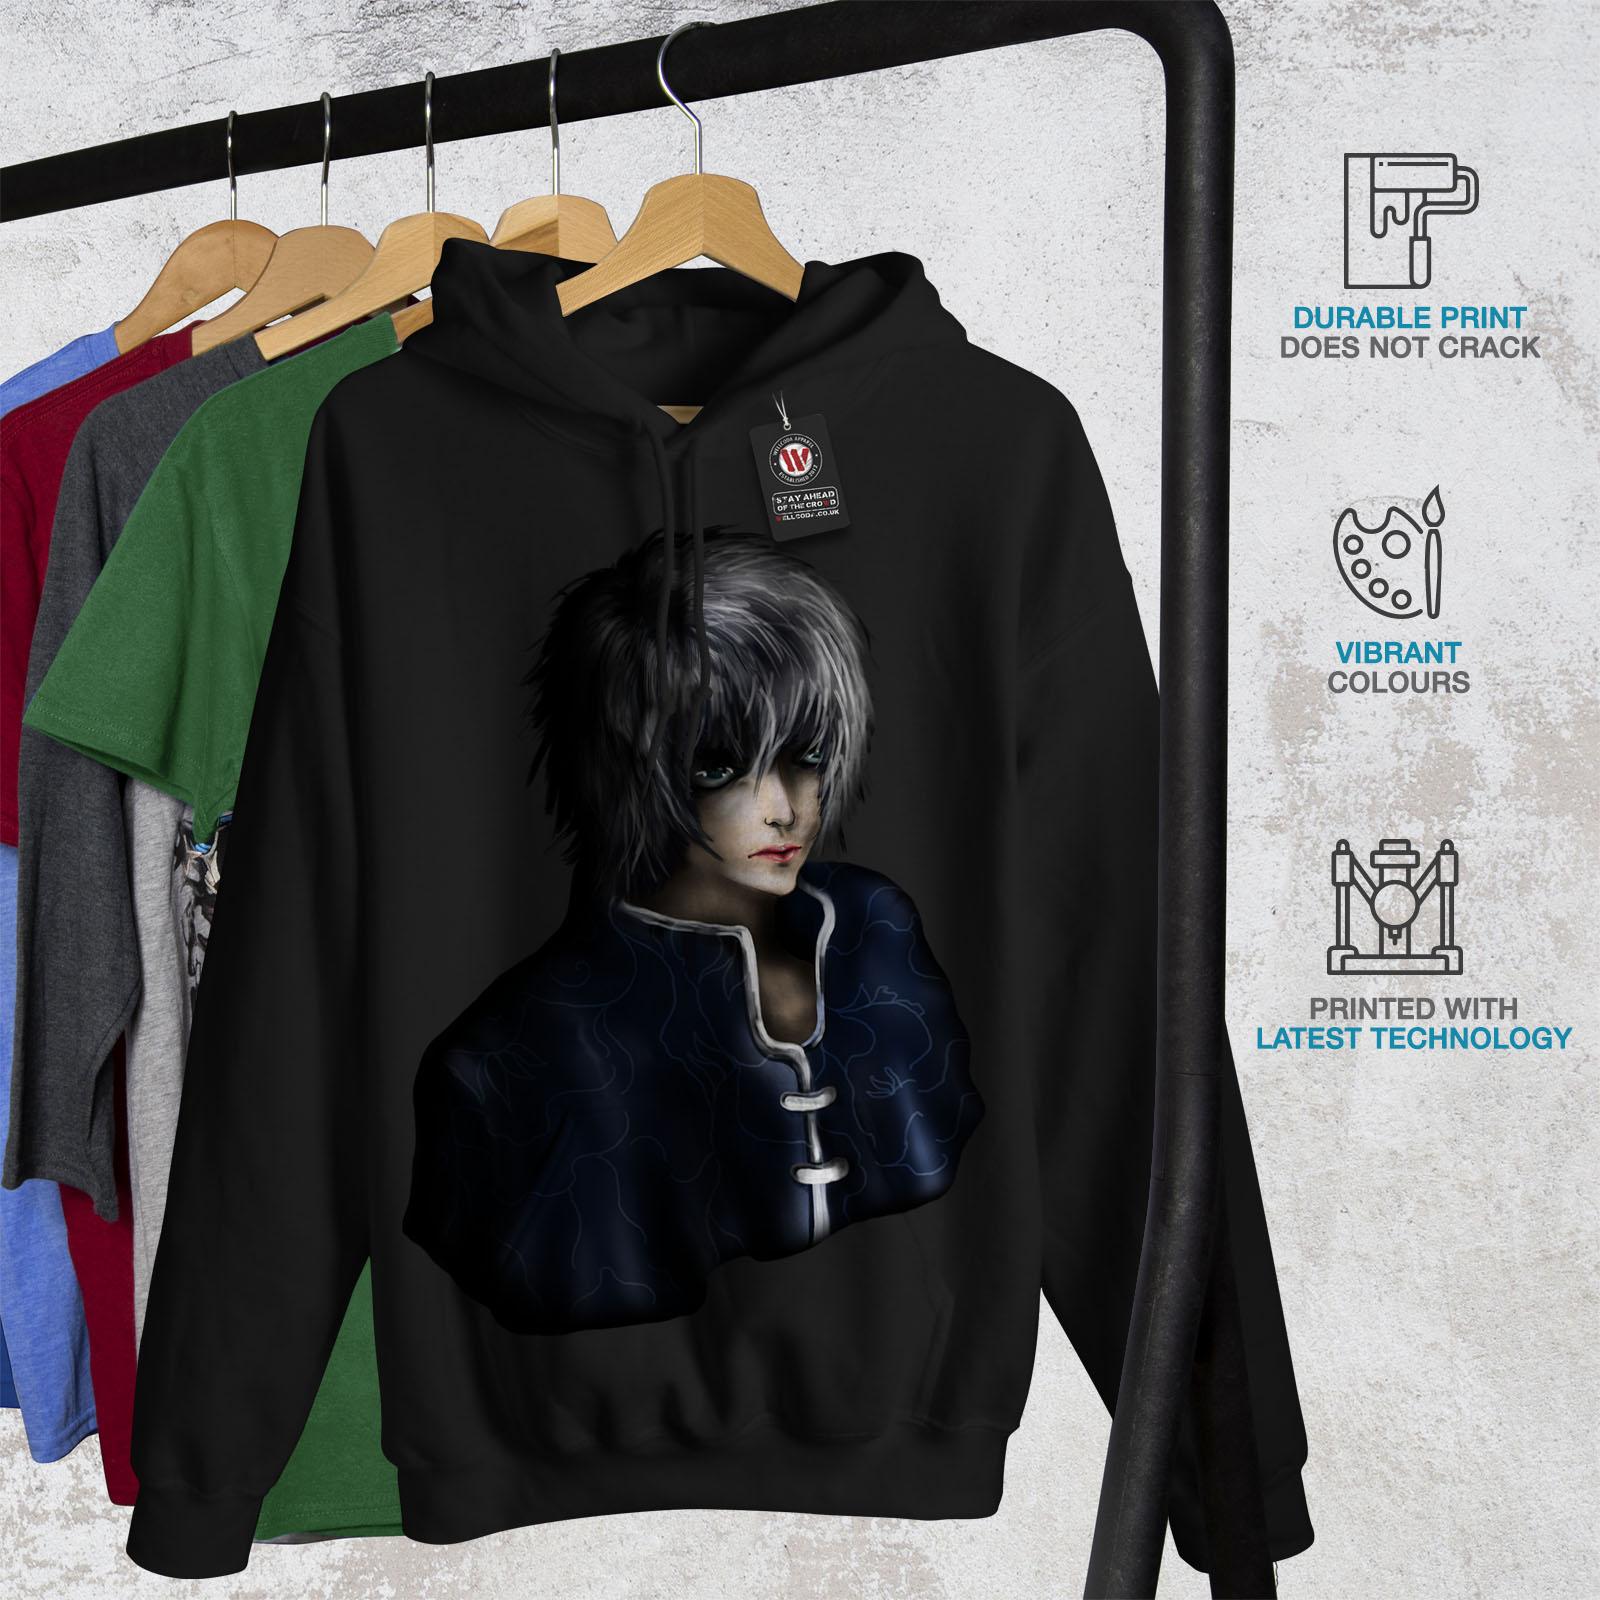 Guy Japan Casual Sweatshirt Being Black Hoodie Wellcoda Mens Fantasy Hooded FqEpXMxSw